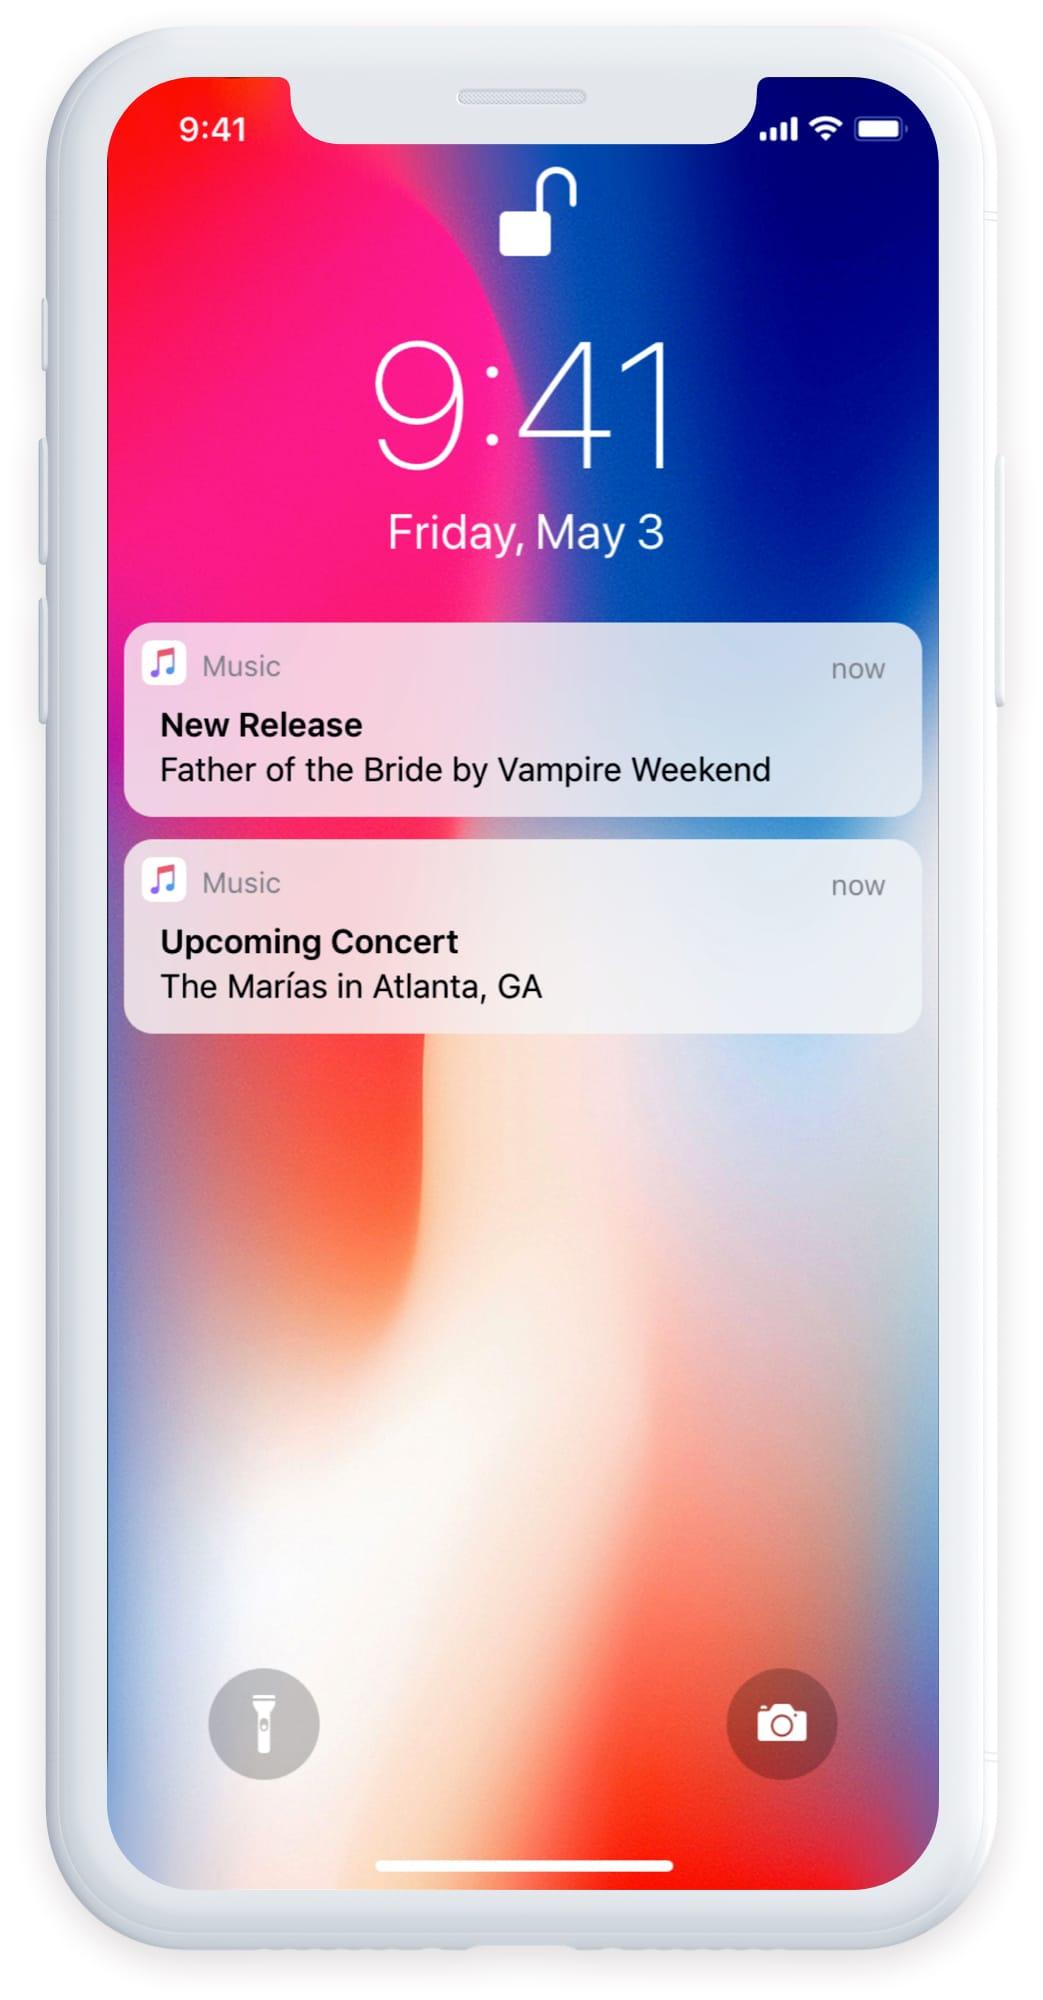 lock screen showing notification